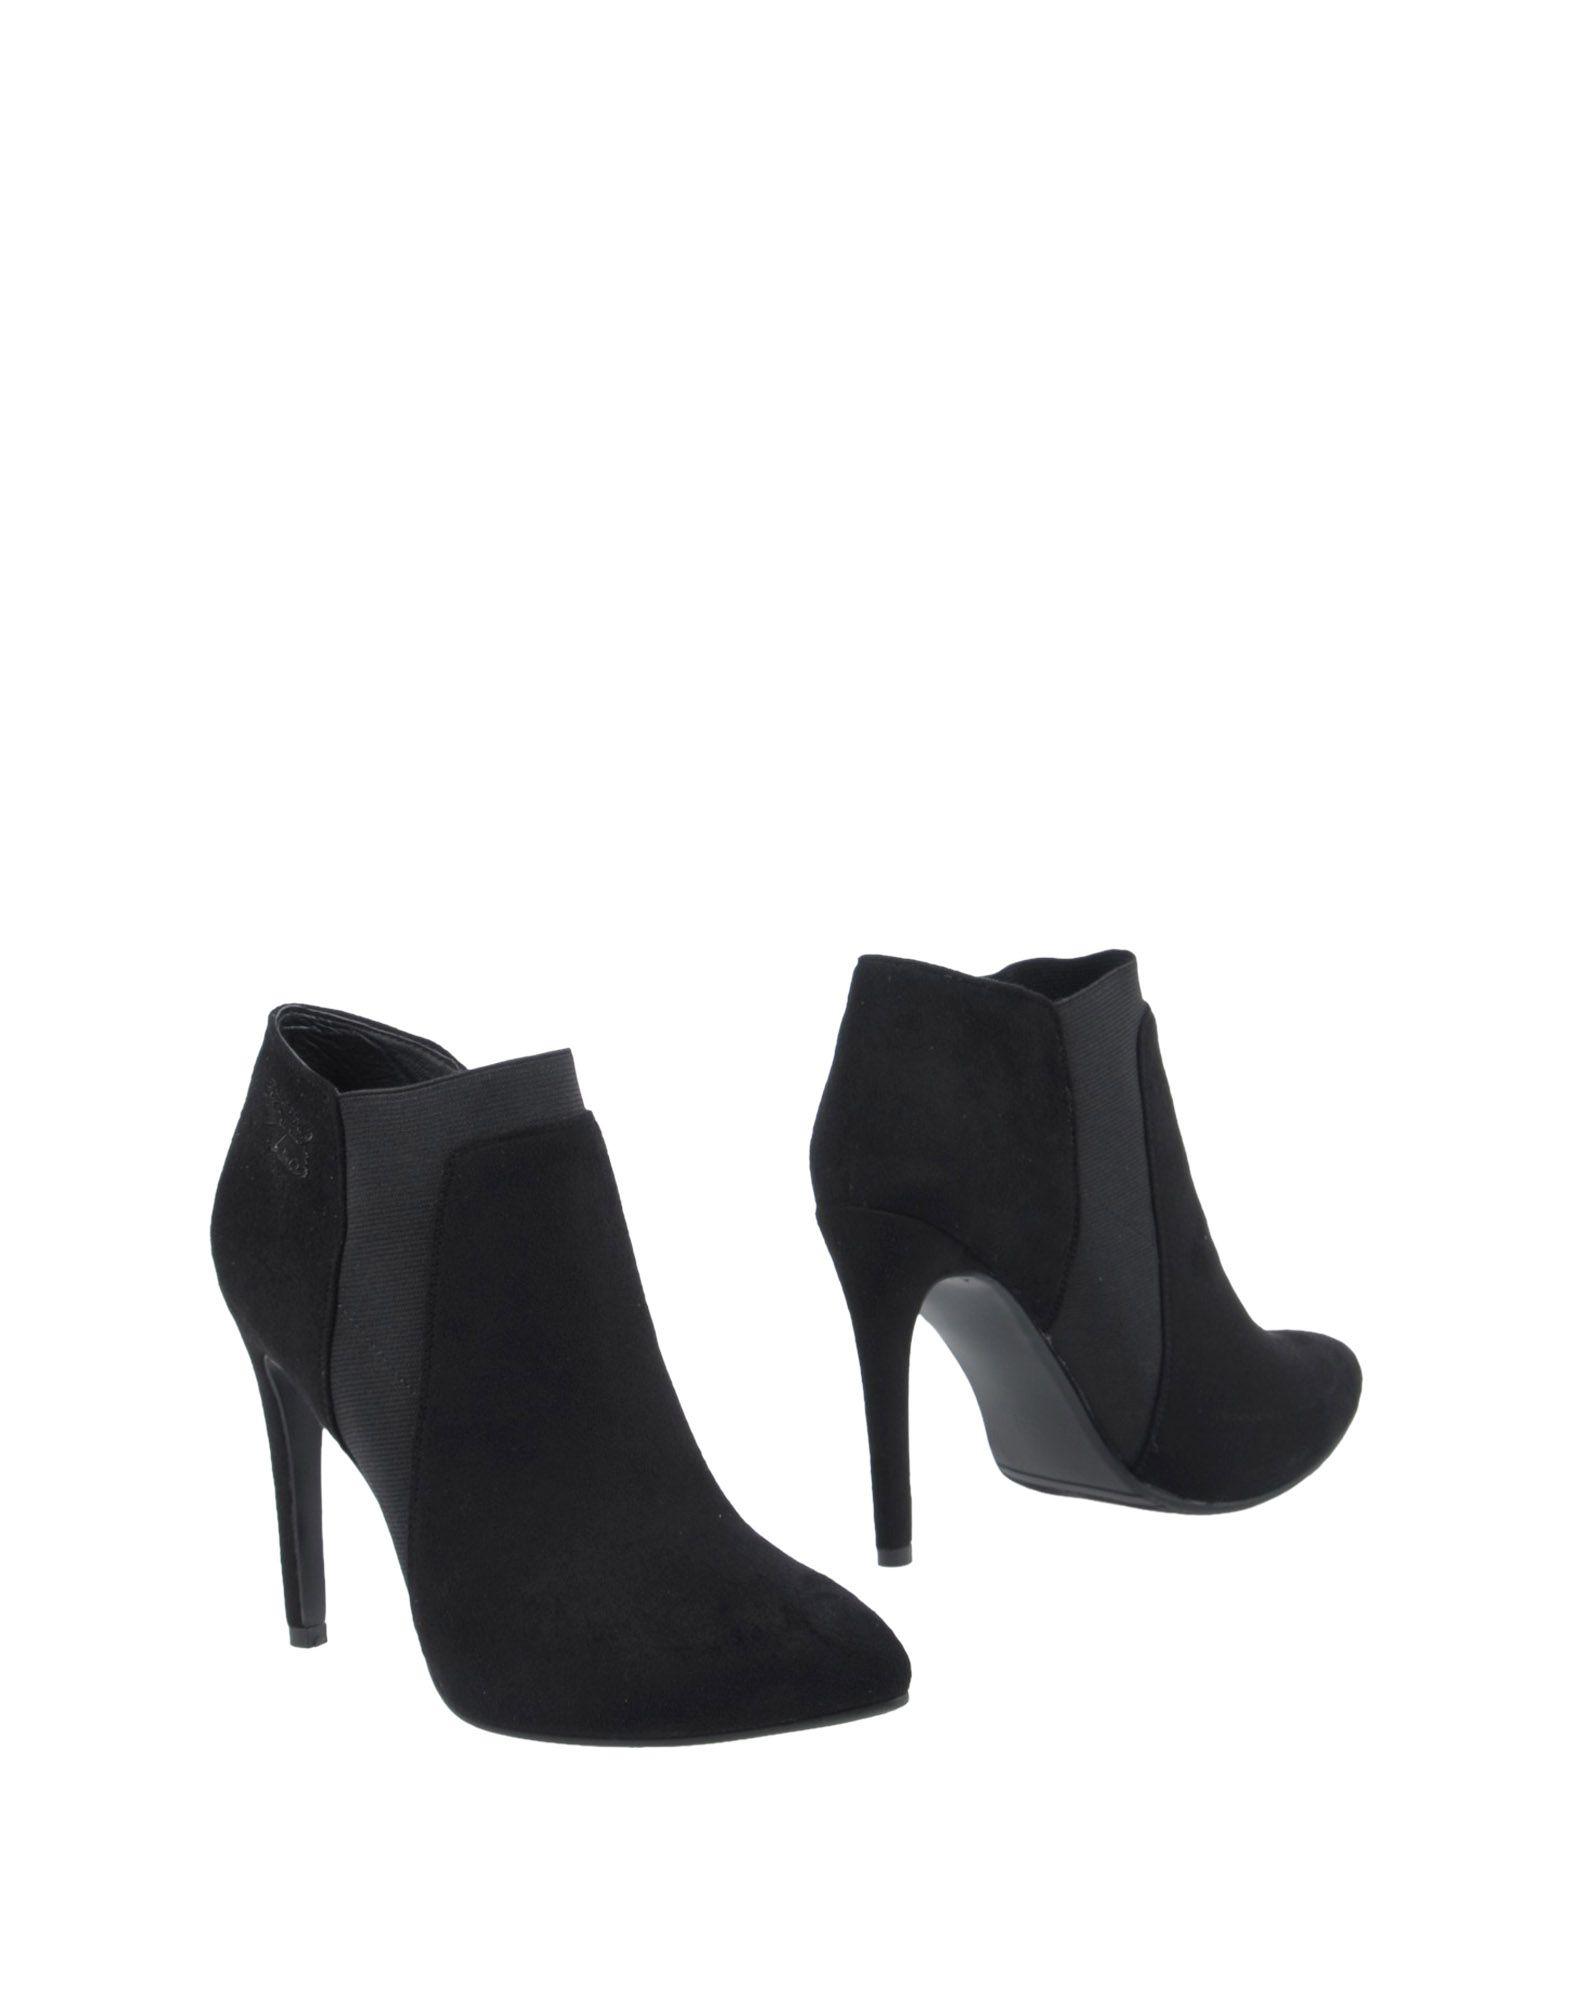 TUA BY BRACCIALINI Полусапоги и высокие ботинки цены онлайн